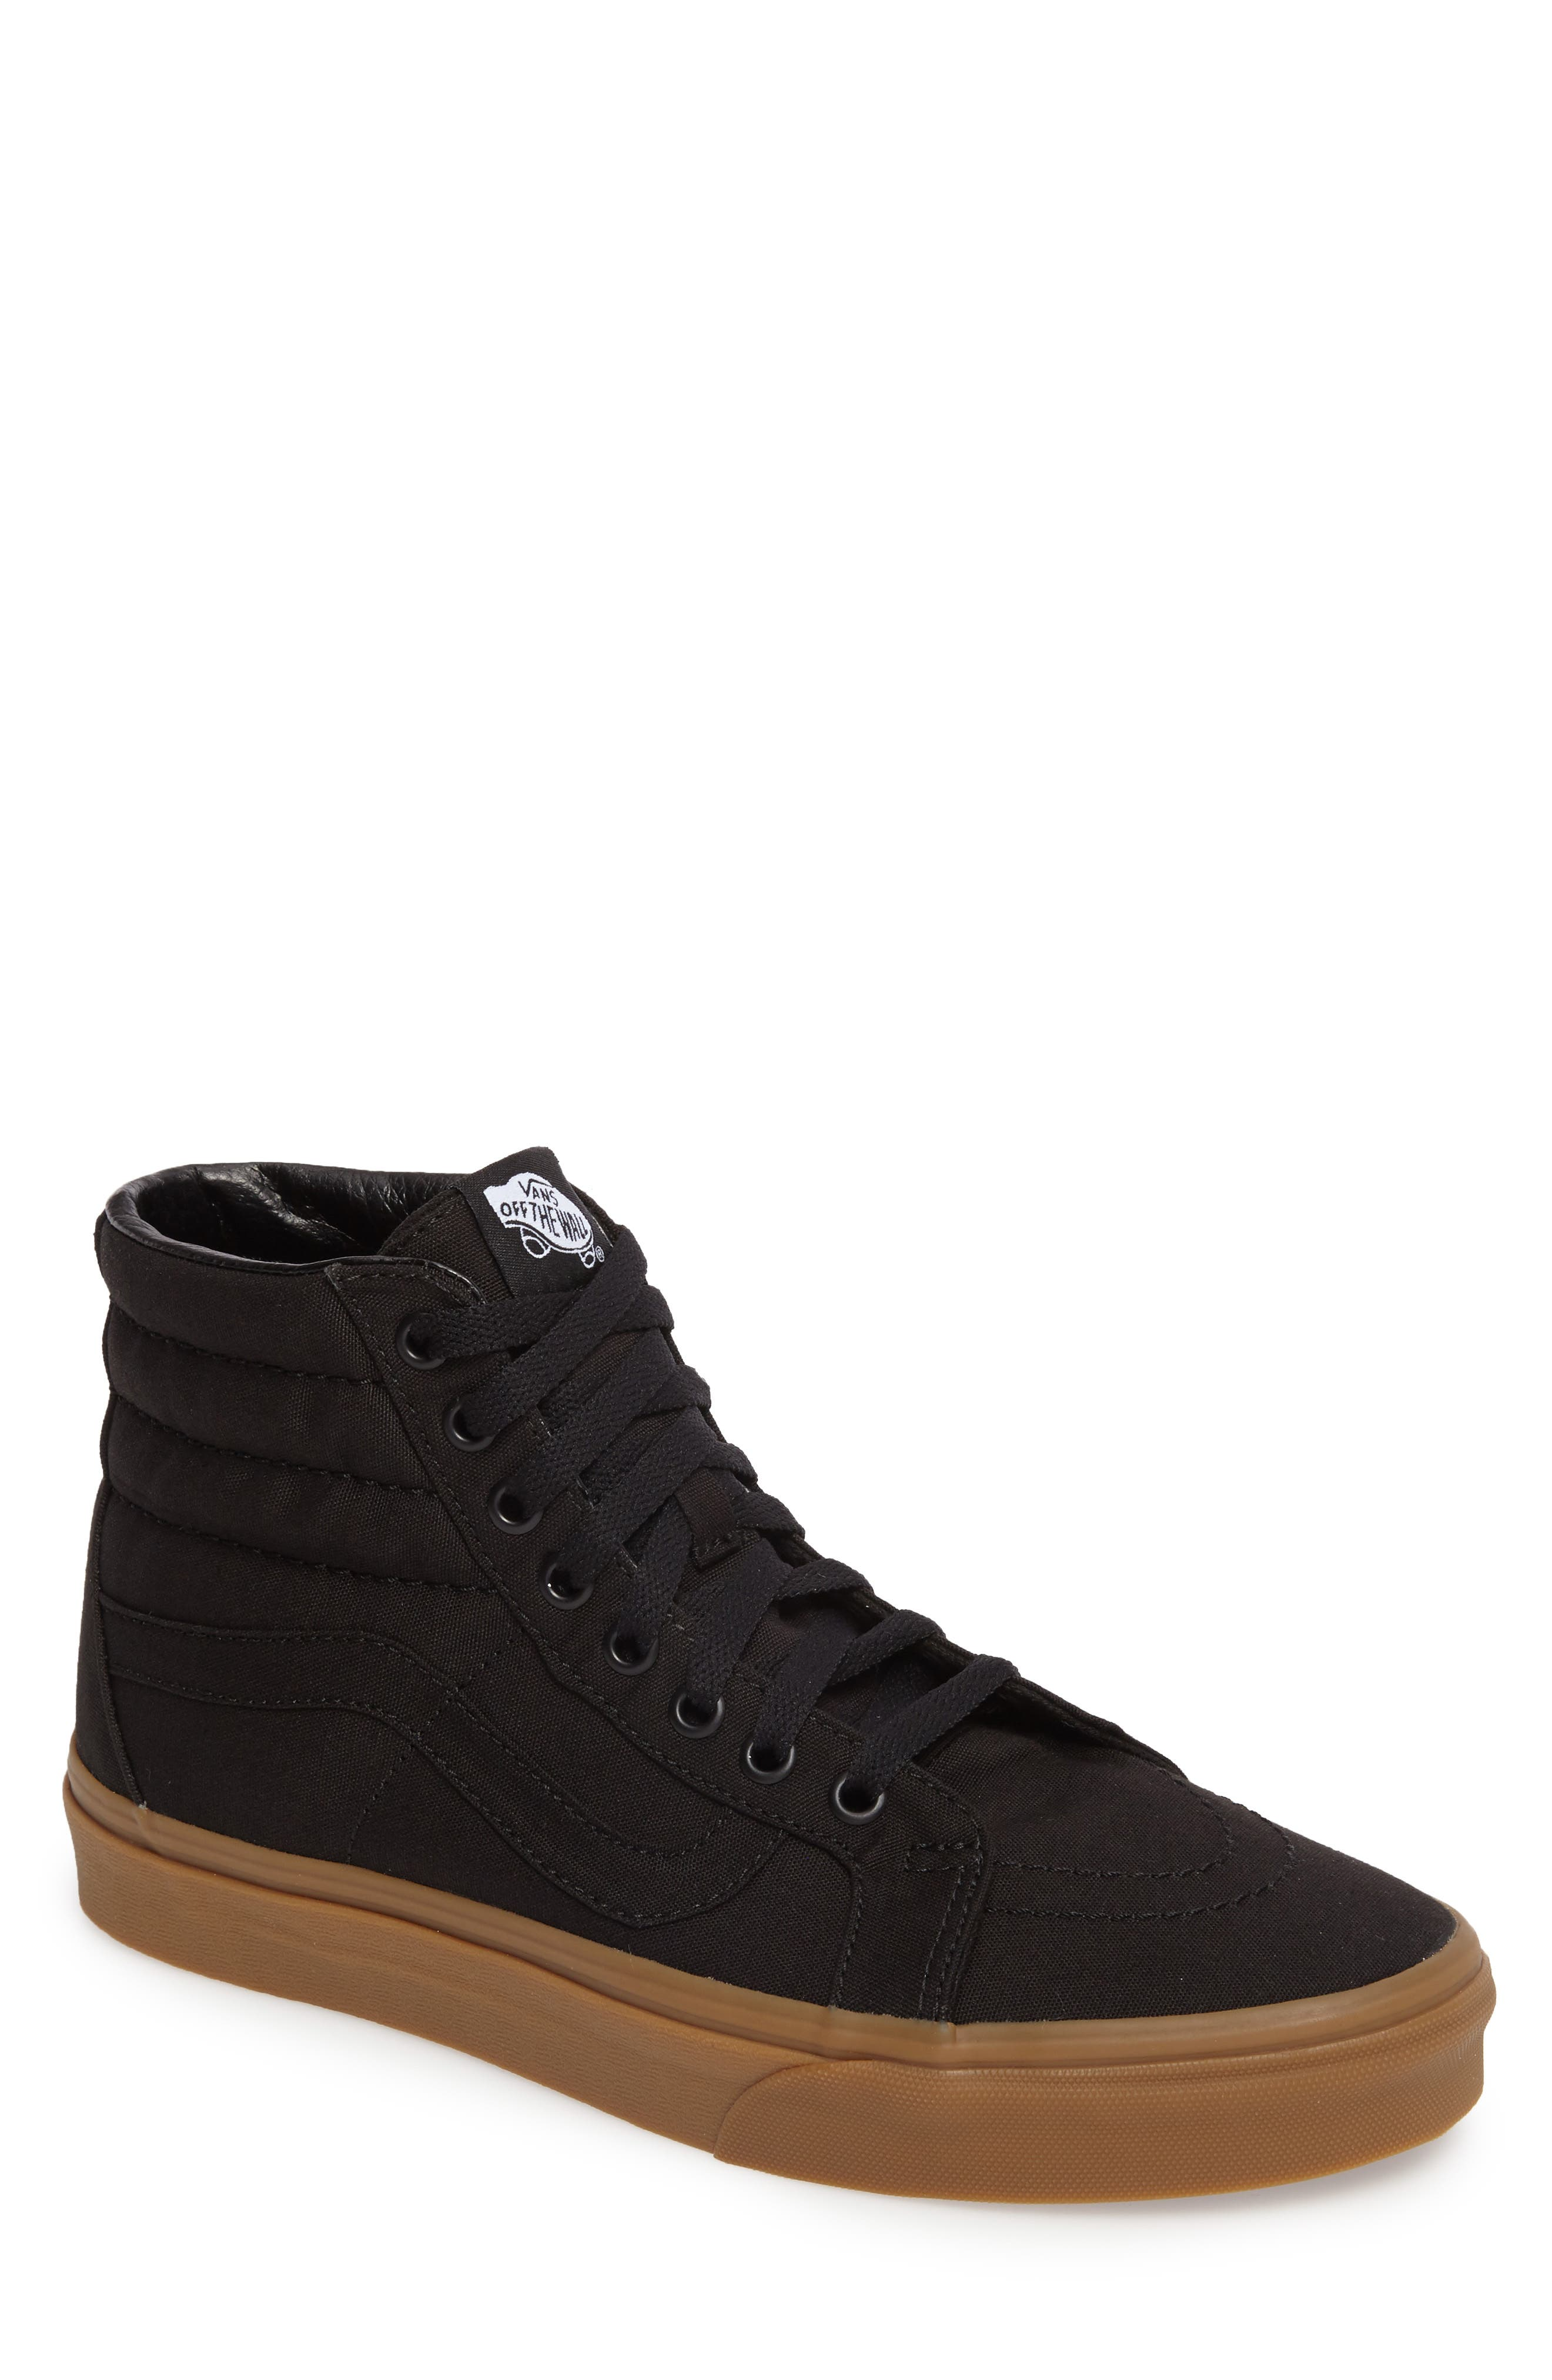 'Sk8-Hi Reissue' Sneaker,                         Main,                         color, 002